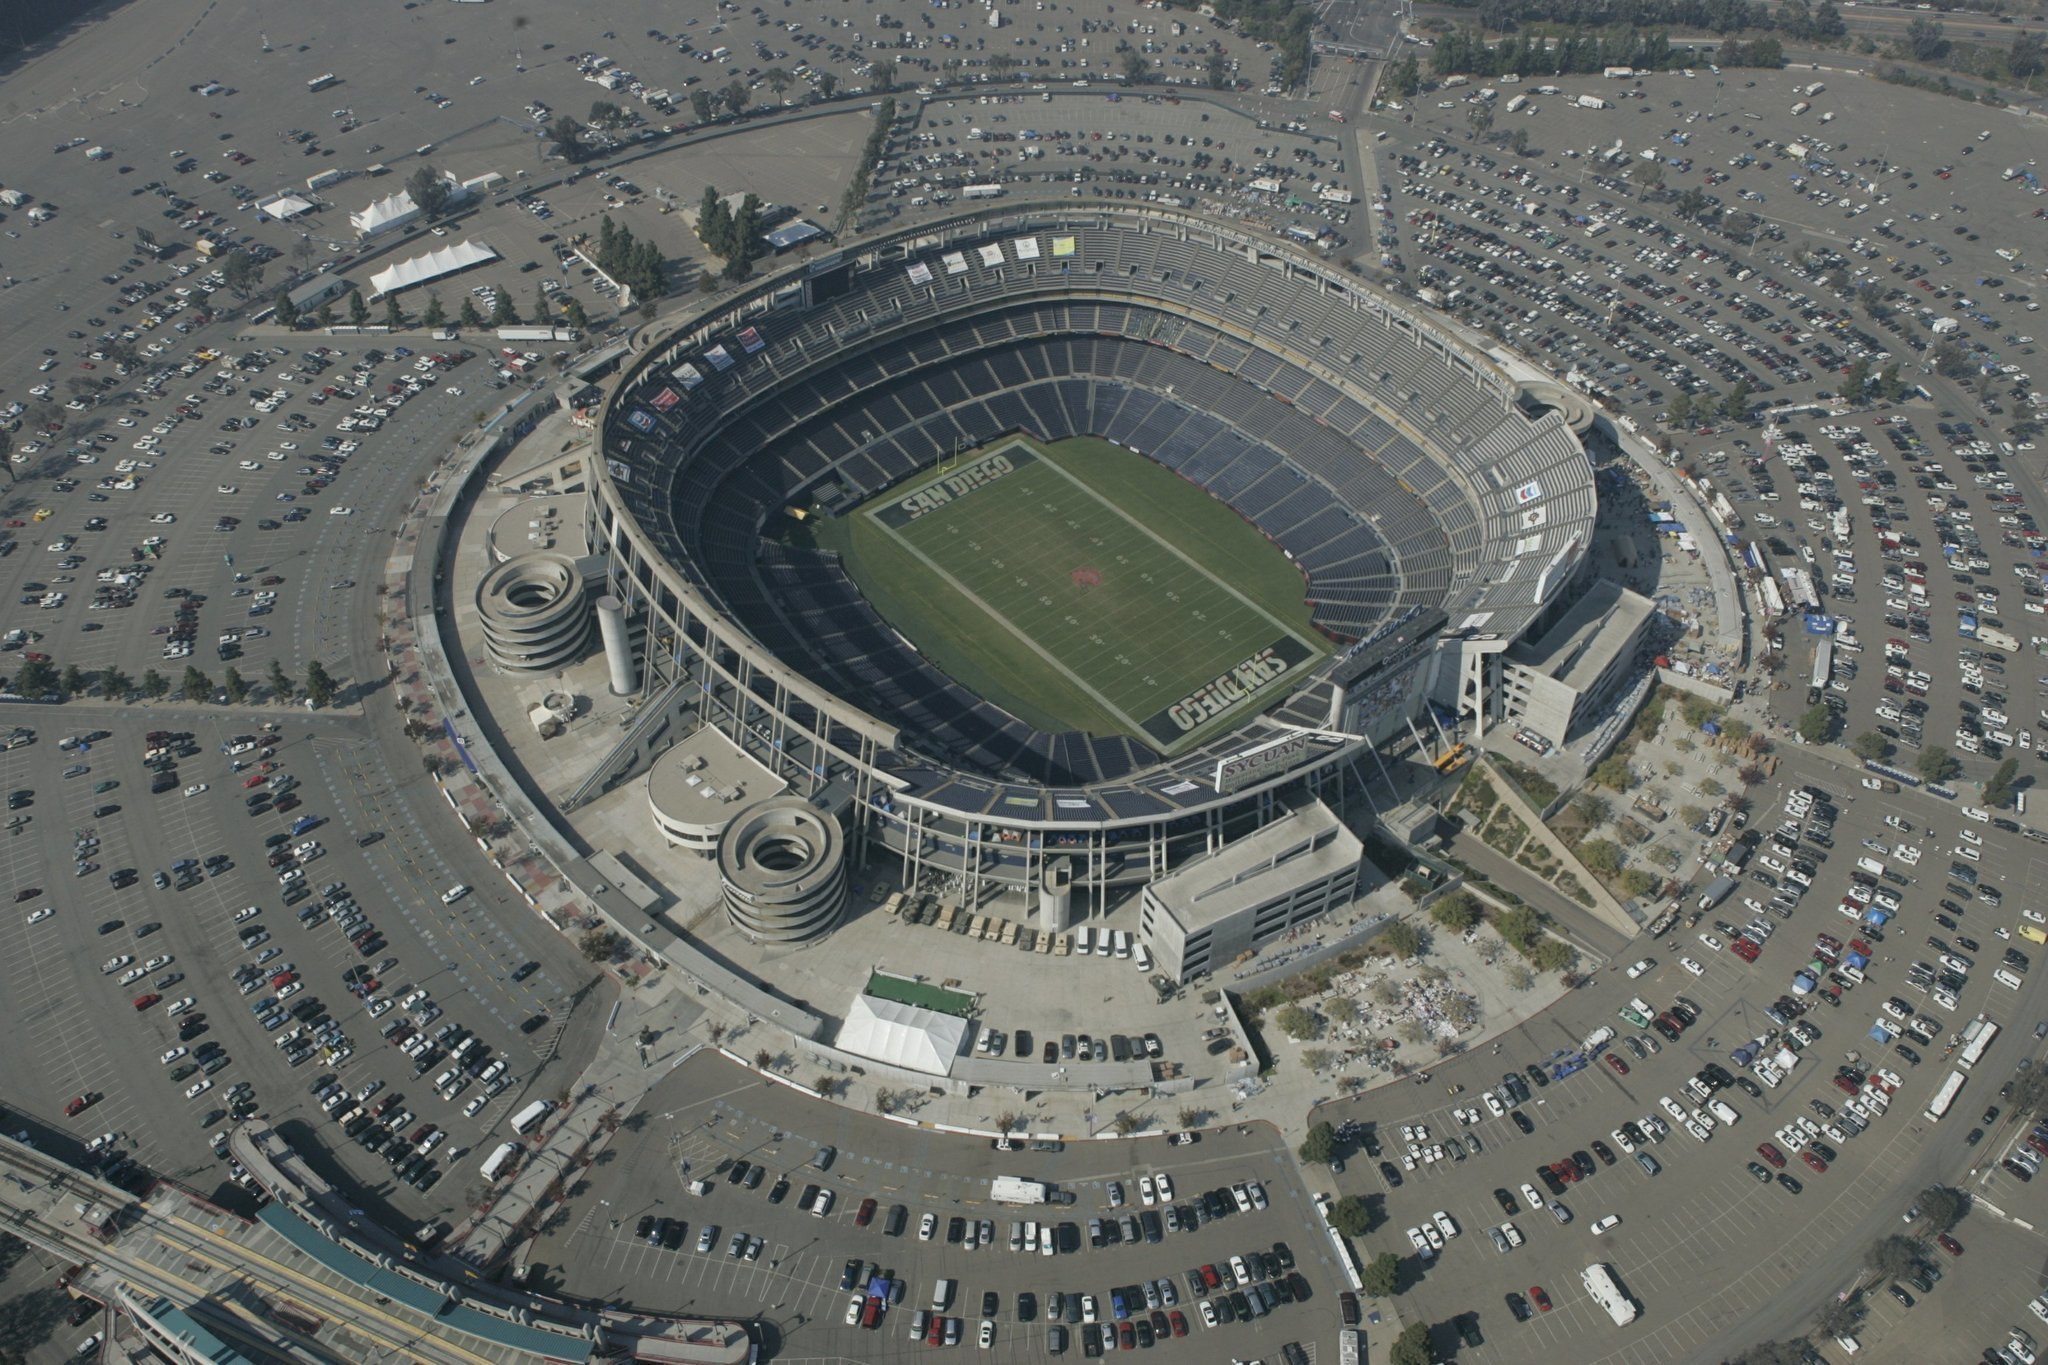 Architects aim to preserve Qual m Stadium The San Diego Union Tribune